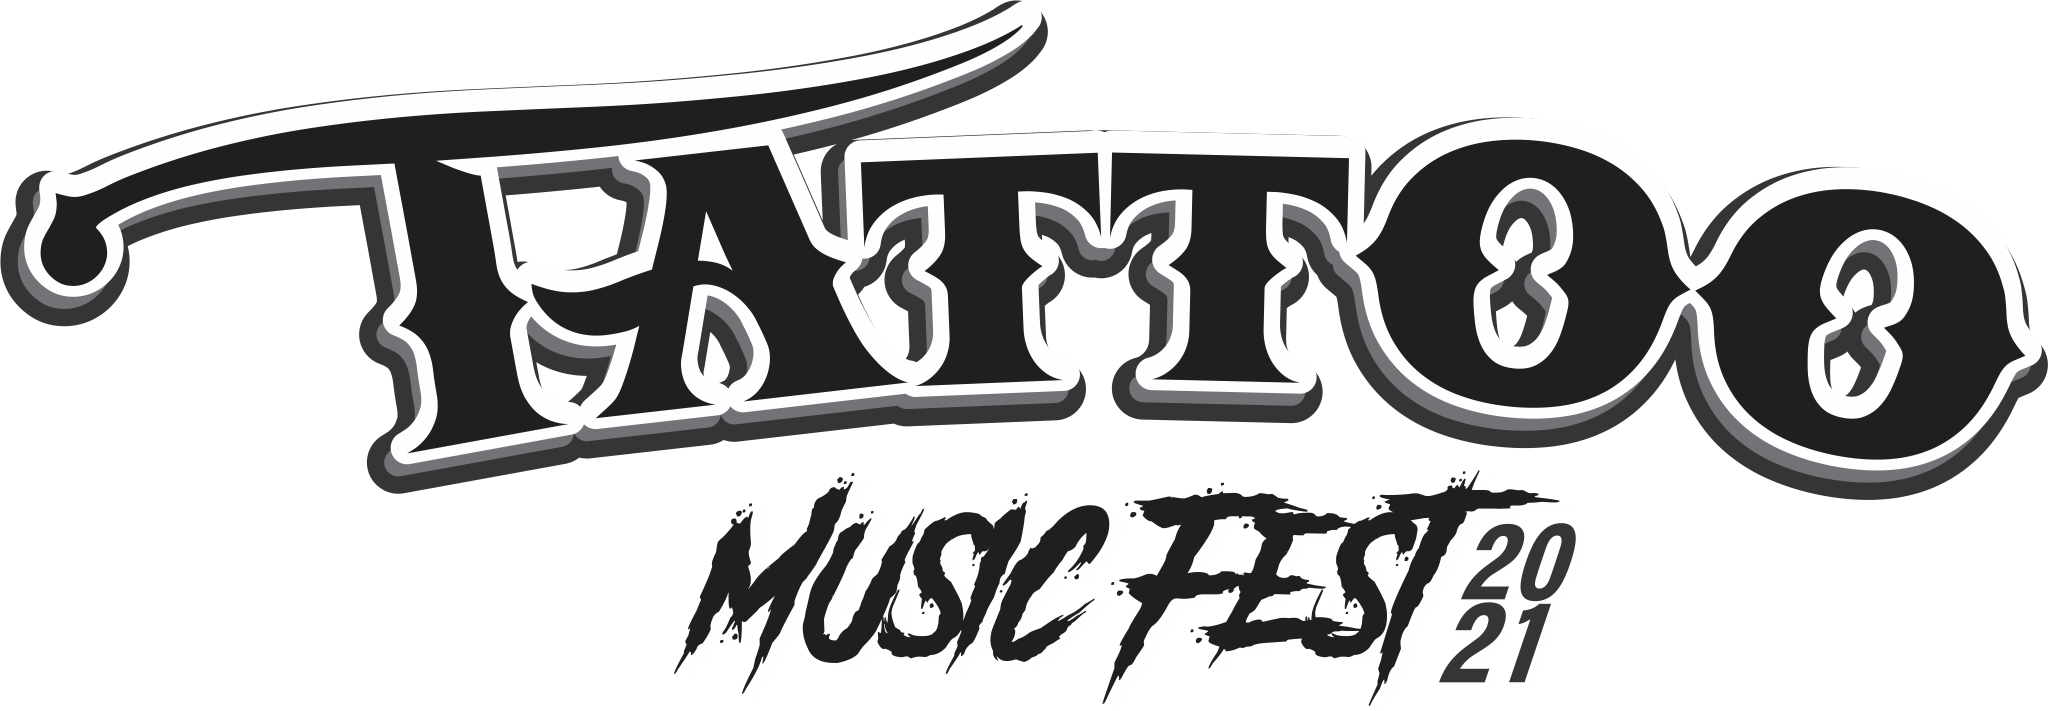 logo 2021 copy